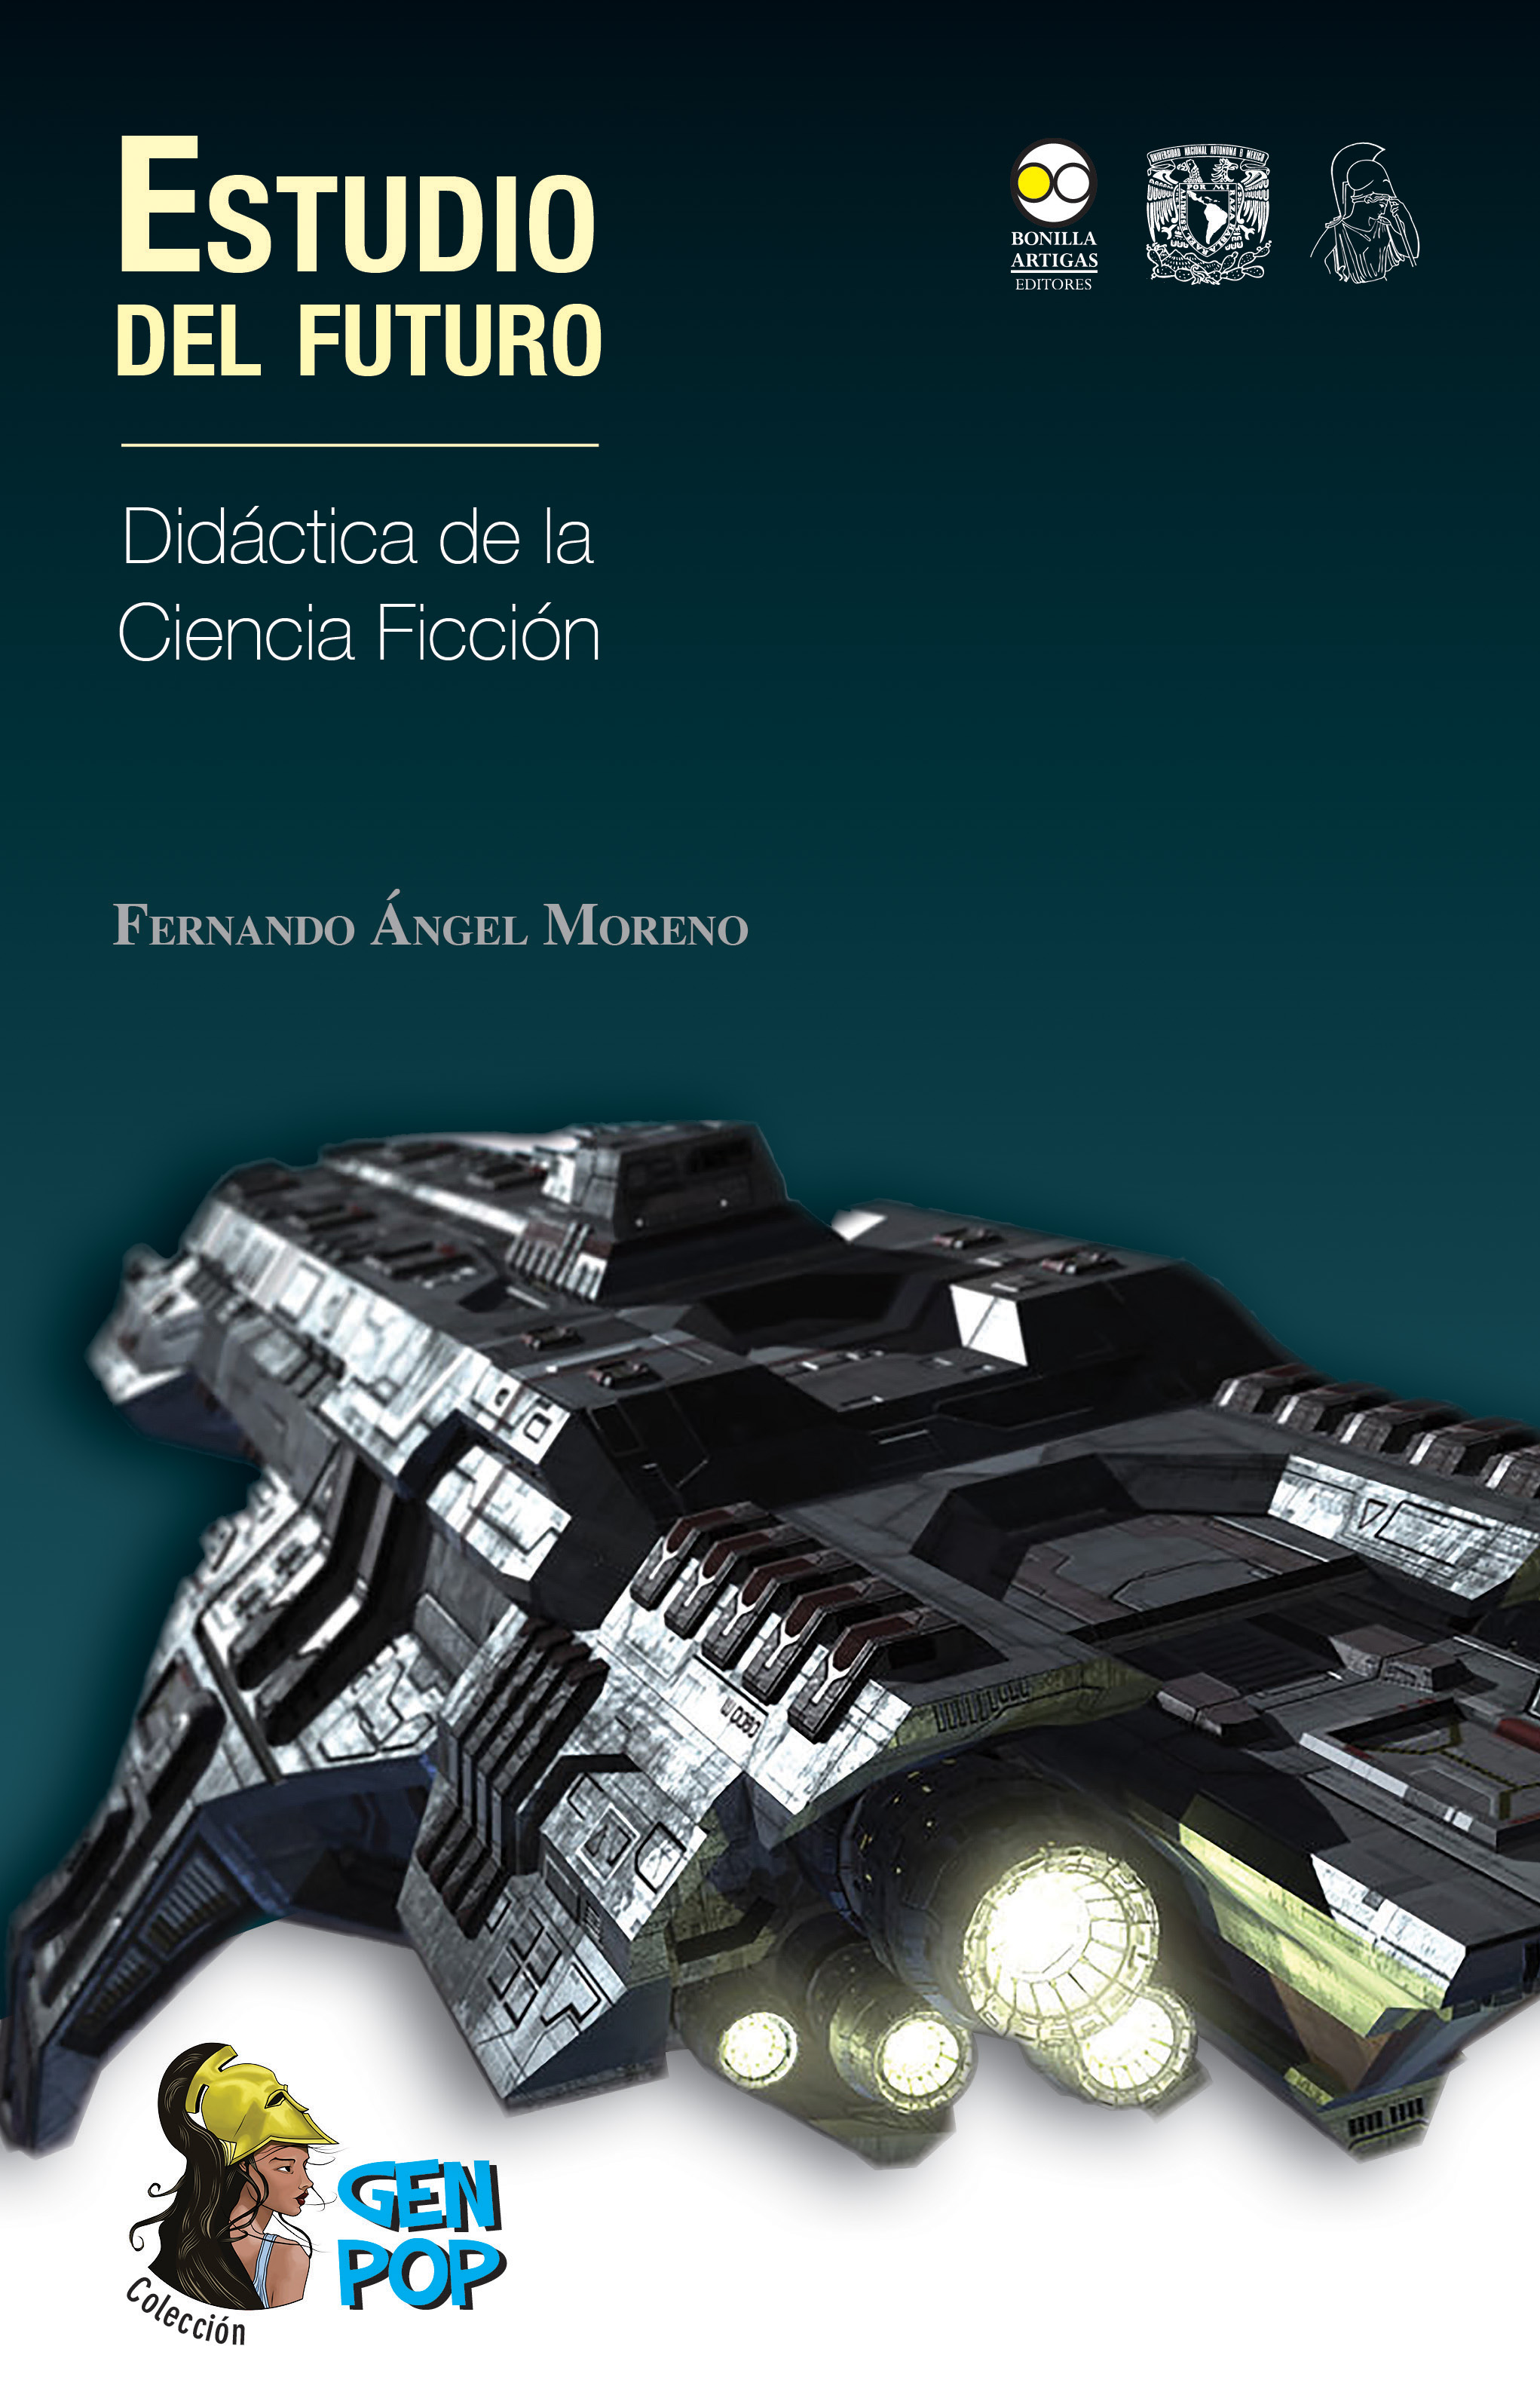 Fernando Angel Moreno Estudio del futuro